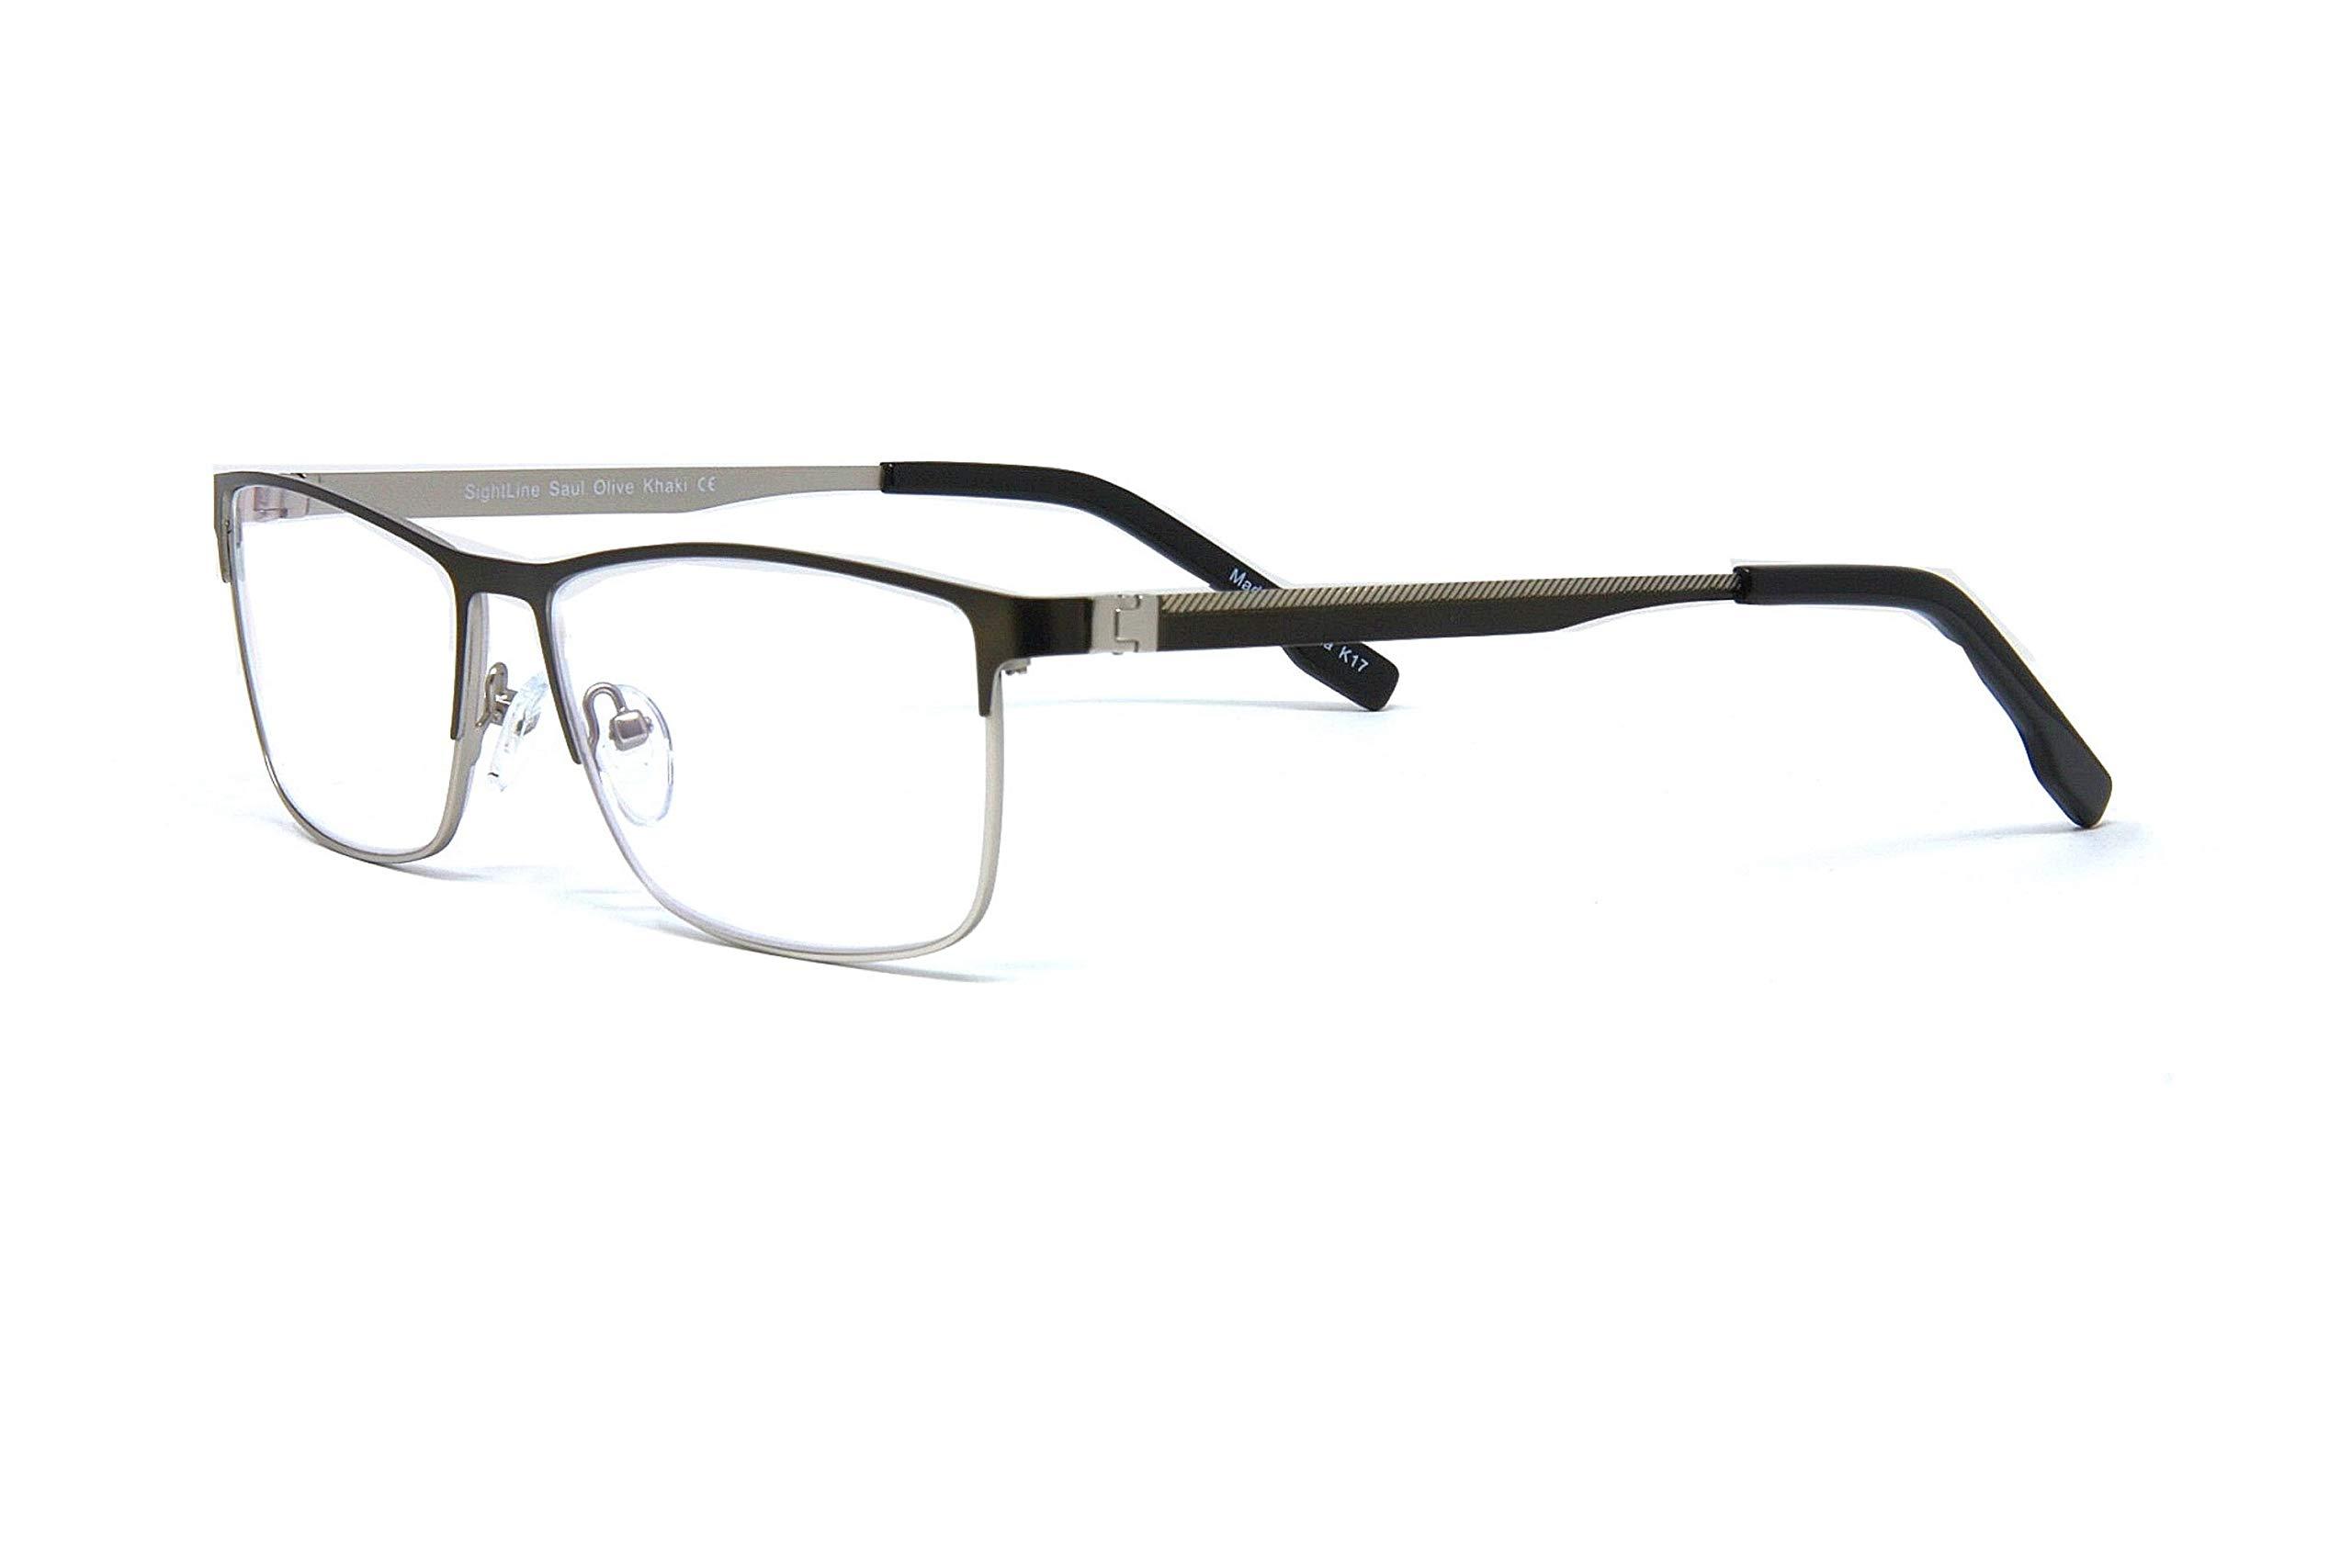 Sightline Saul Progressive Multi Focus Reading Glasses - Premium Quality Frame Handsome Contemporary Fashion